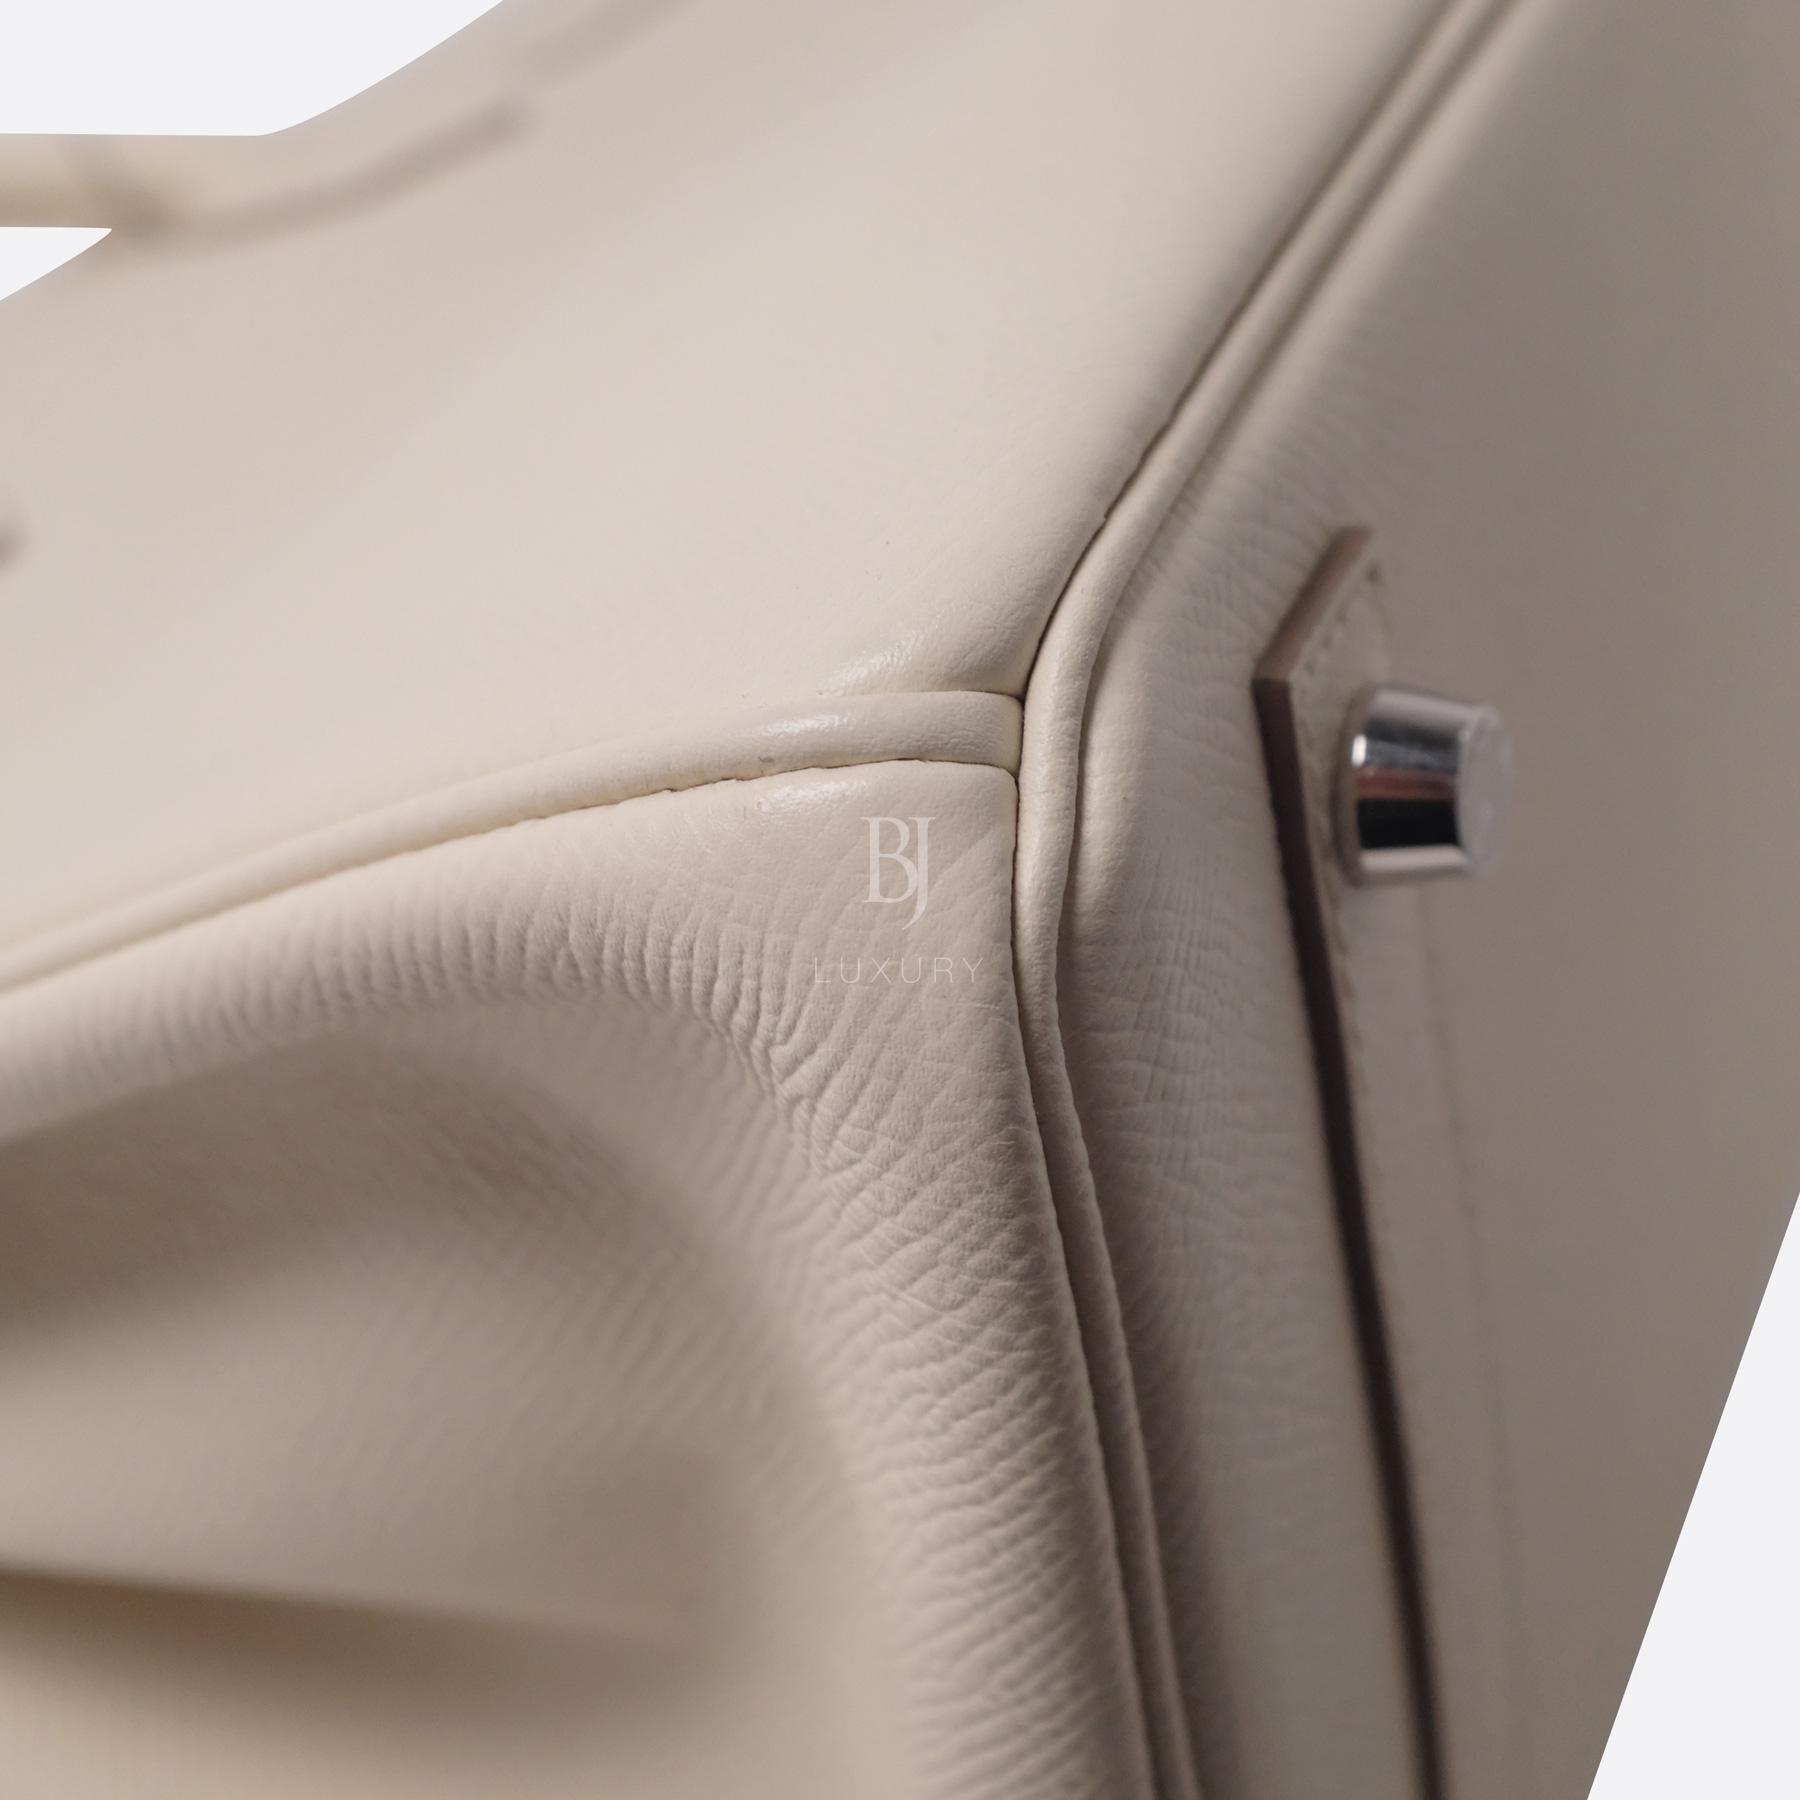 Hermes Birkin 30 Epsom Craie Palladium BJ Luxury 16.jpg